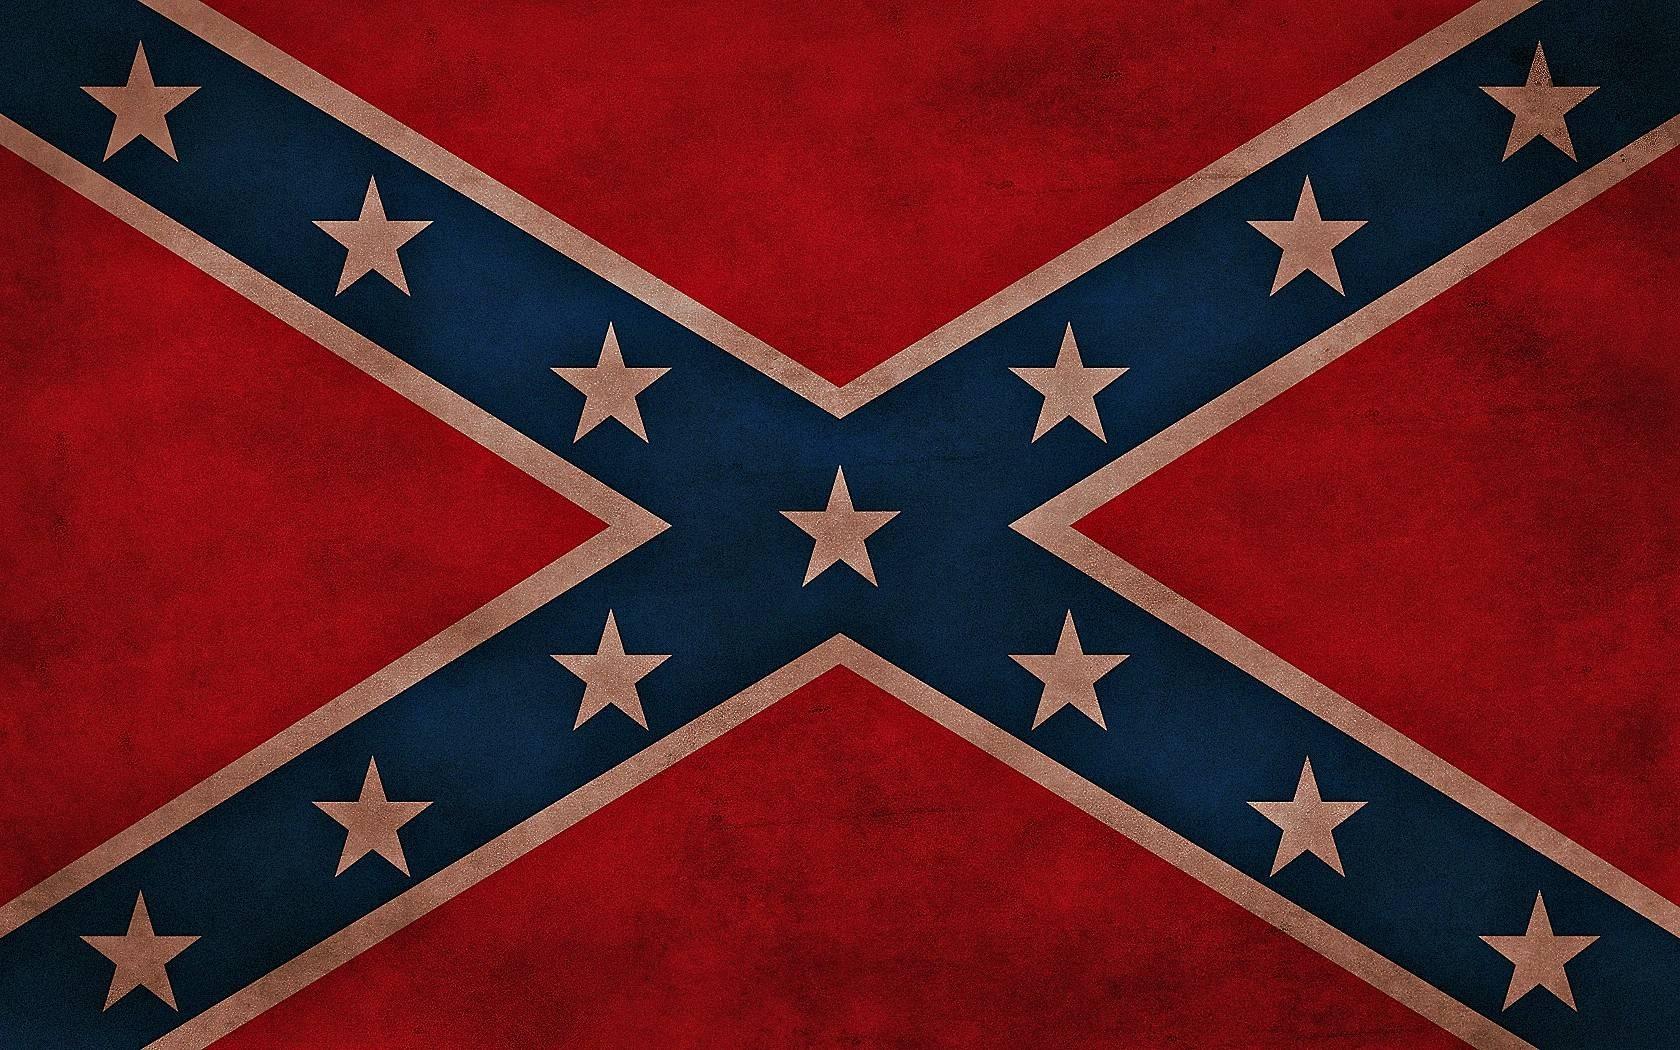 confederate flag wallpapers - wallpaper cave